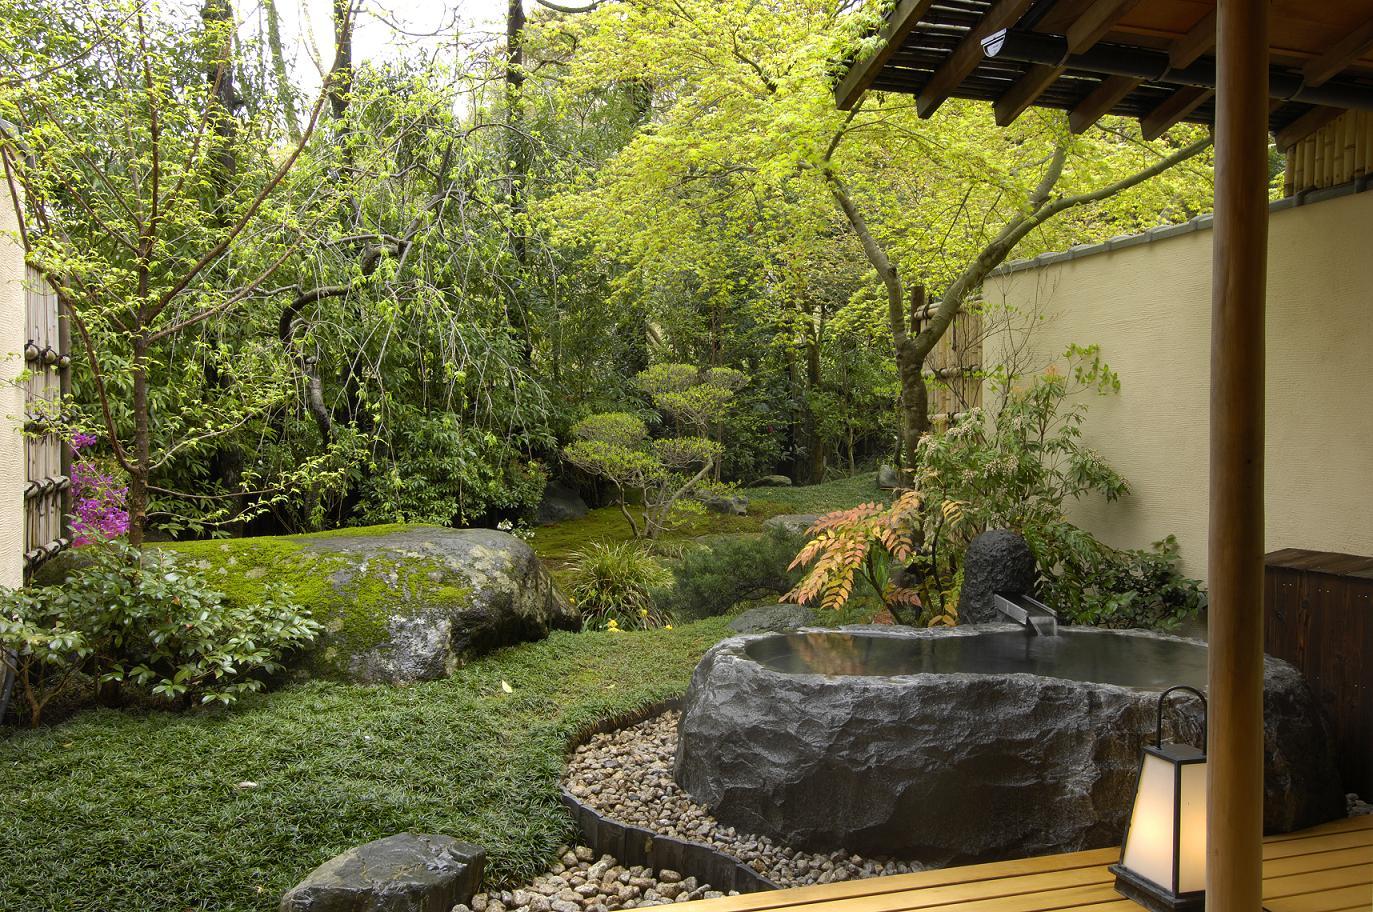 mon plus beau voyage au japon hakone gora kadan ryokan le jardin zen mon plus beau voyage. Black Bedroom Furniture Sets. Home Design Ideas